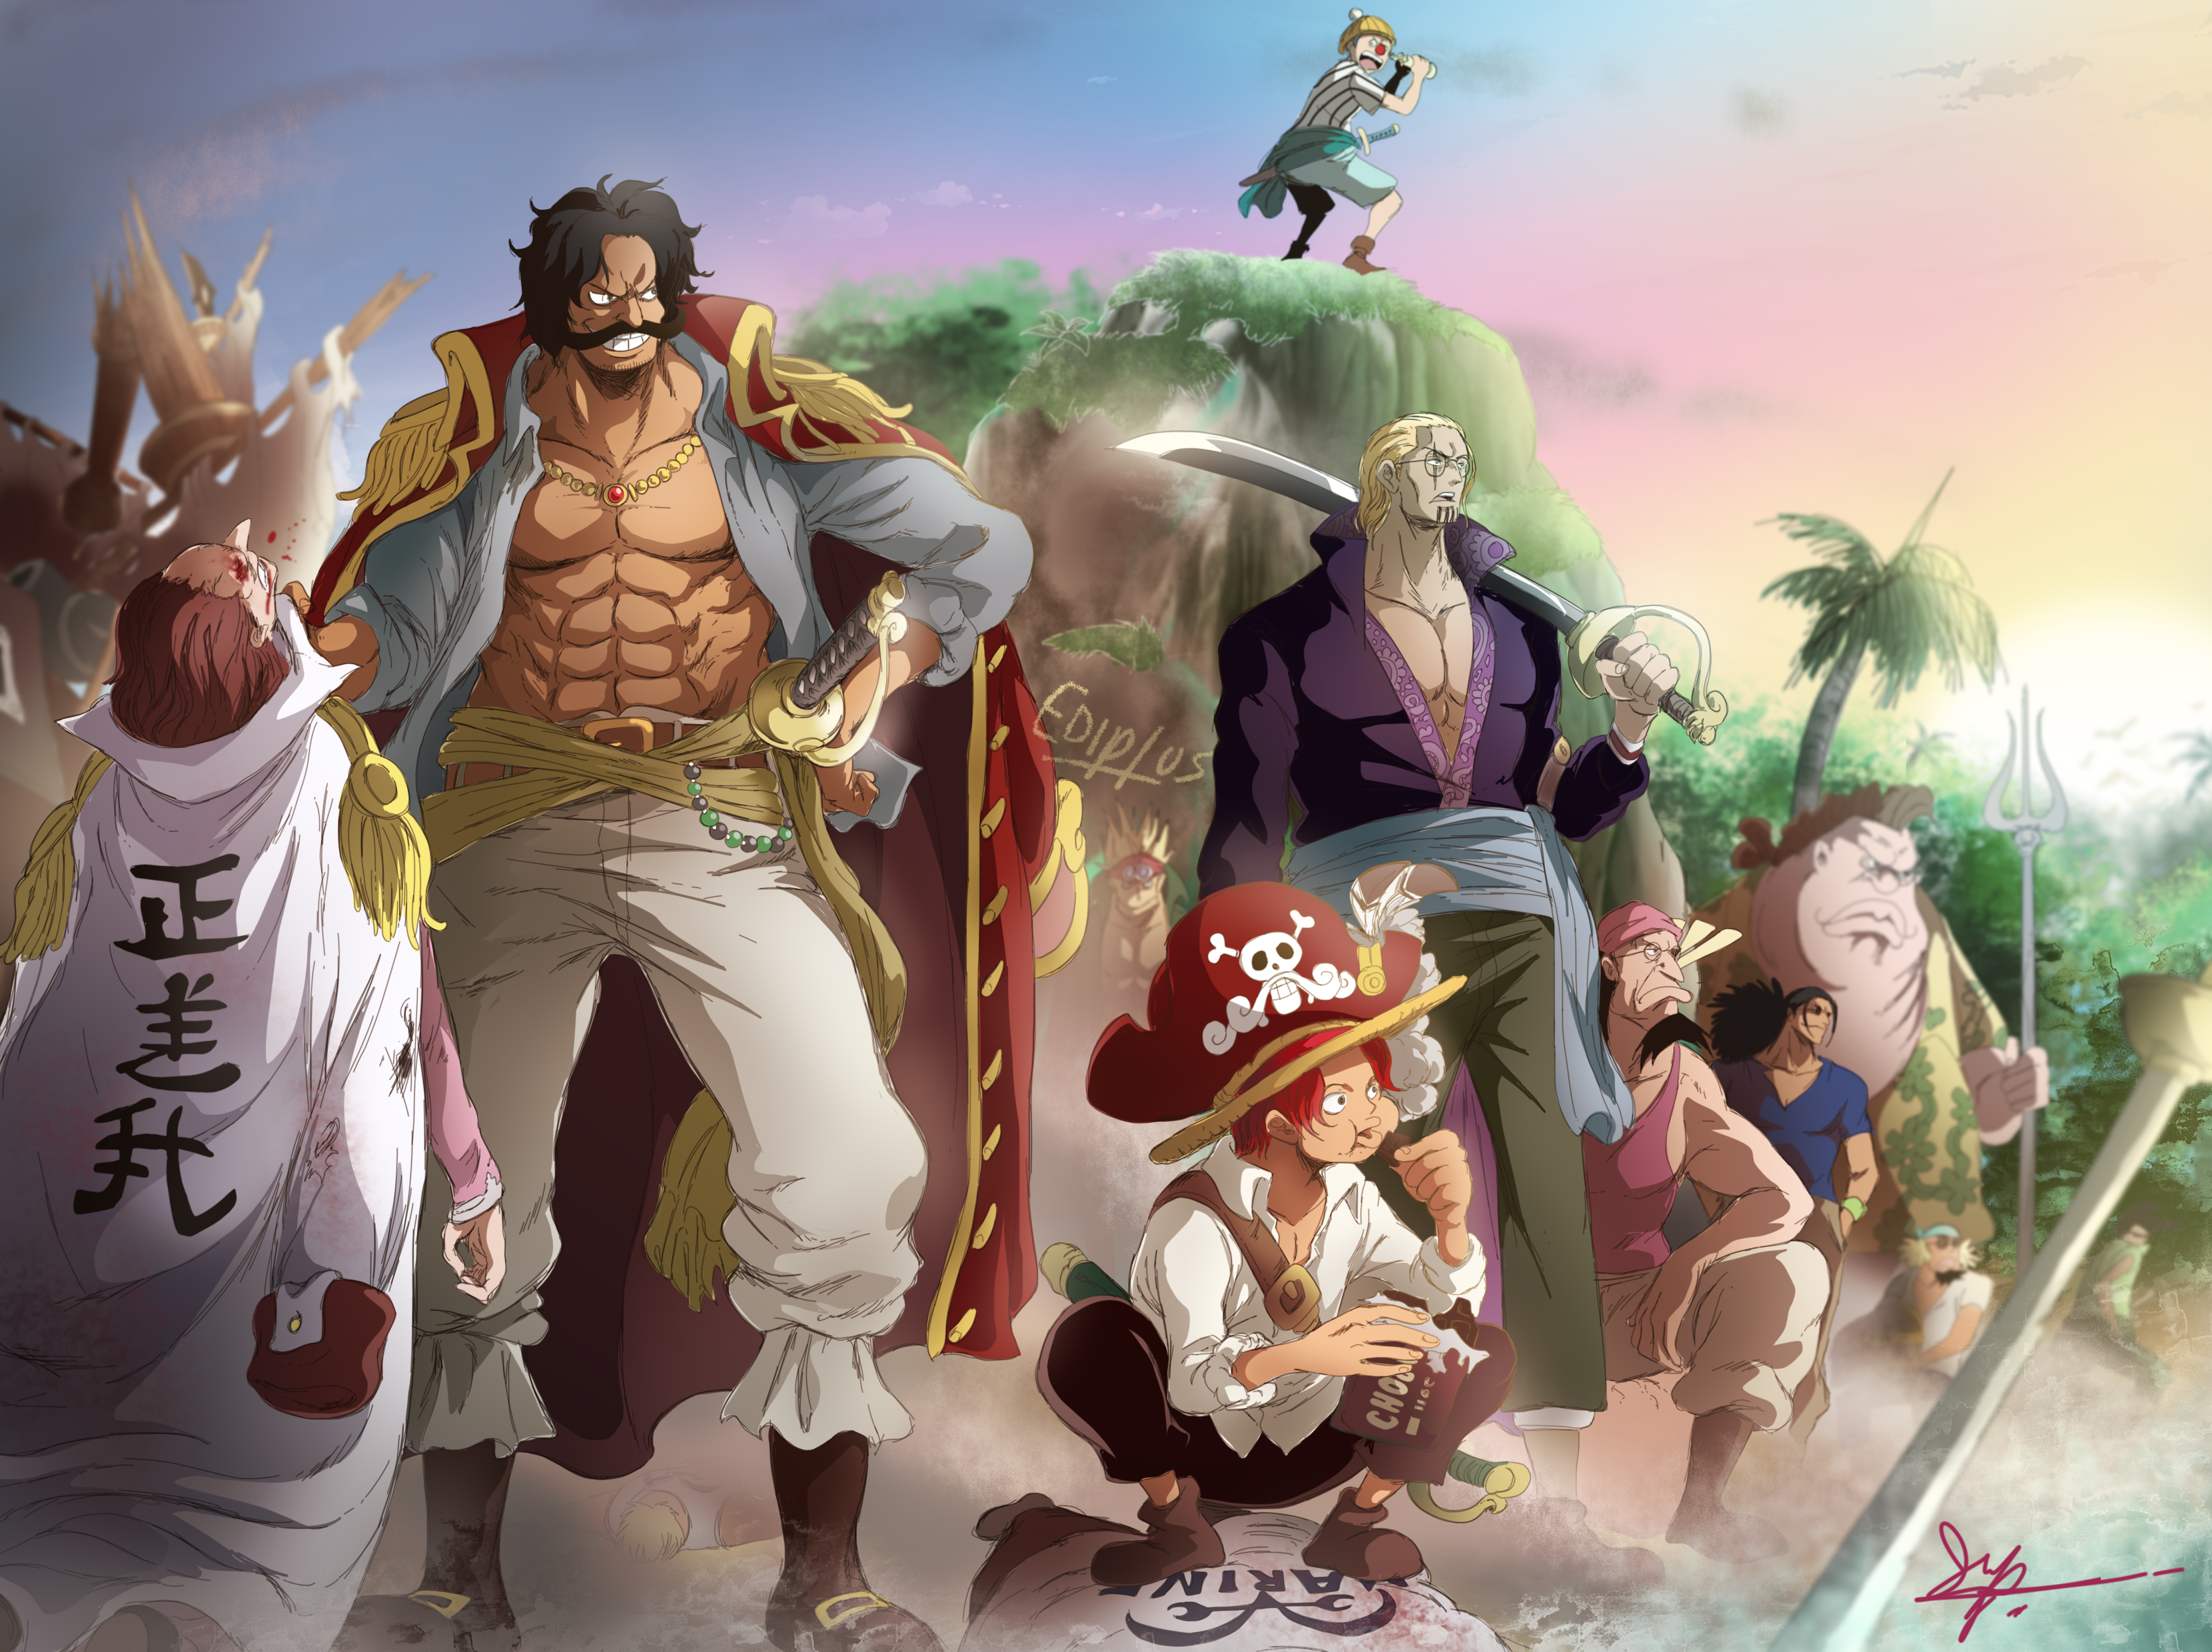 Anime 3320x2480 One Piece Roger Shanks anime Rayleigh buggy